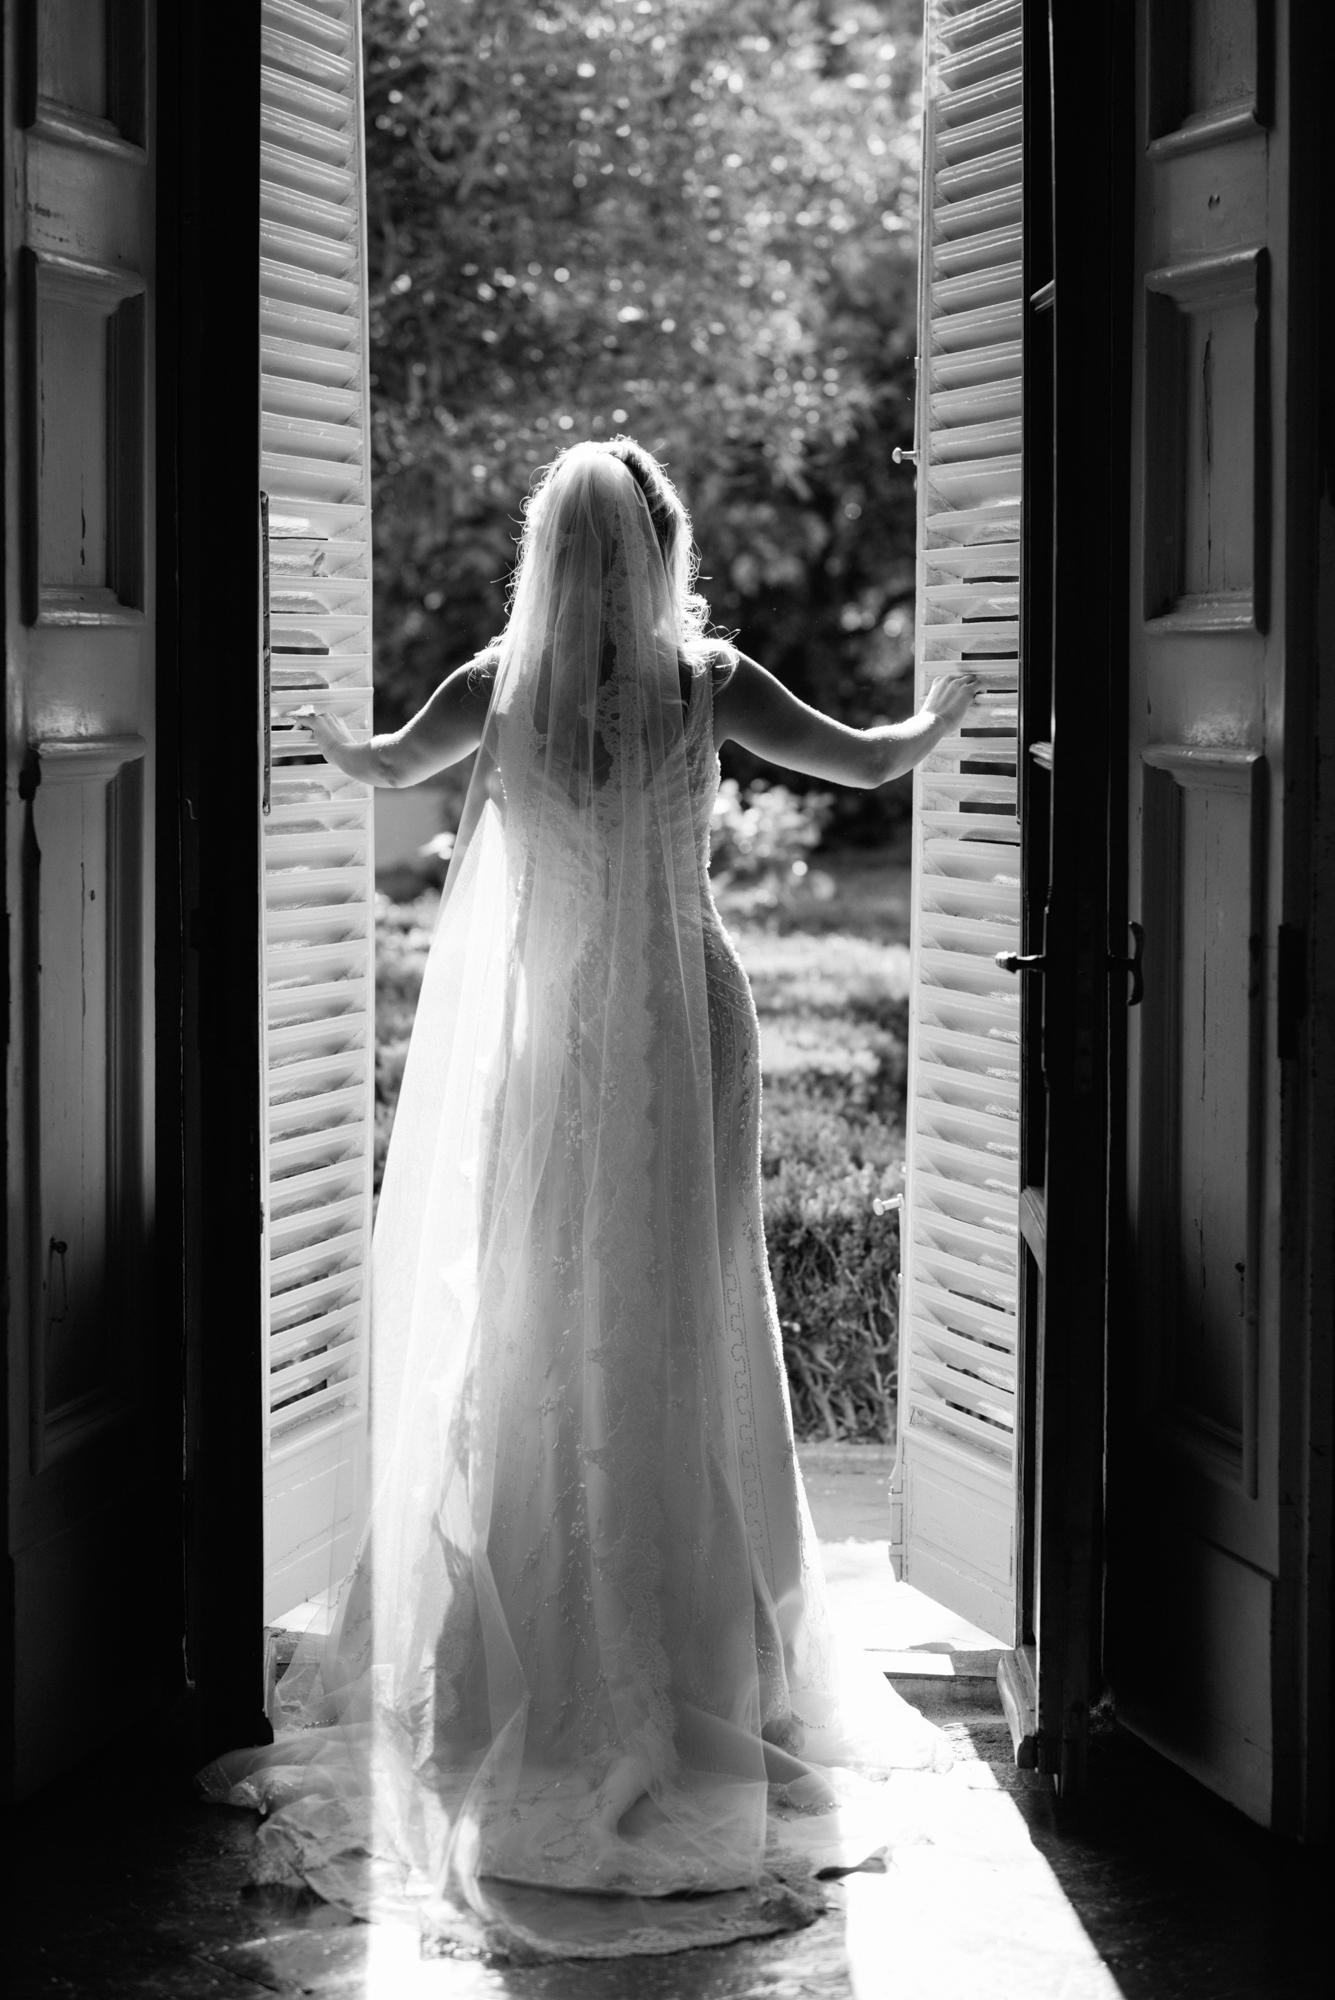 Wedding_Photographer_in_Tuscany_Italy-011.jpg